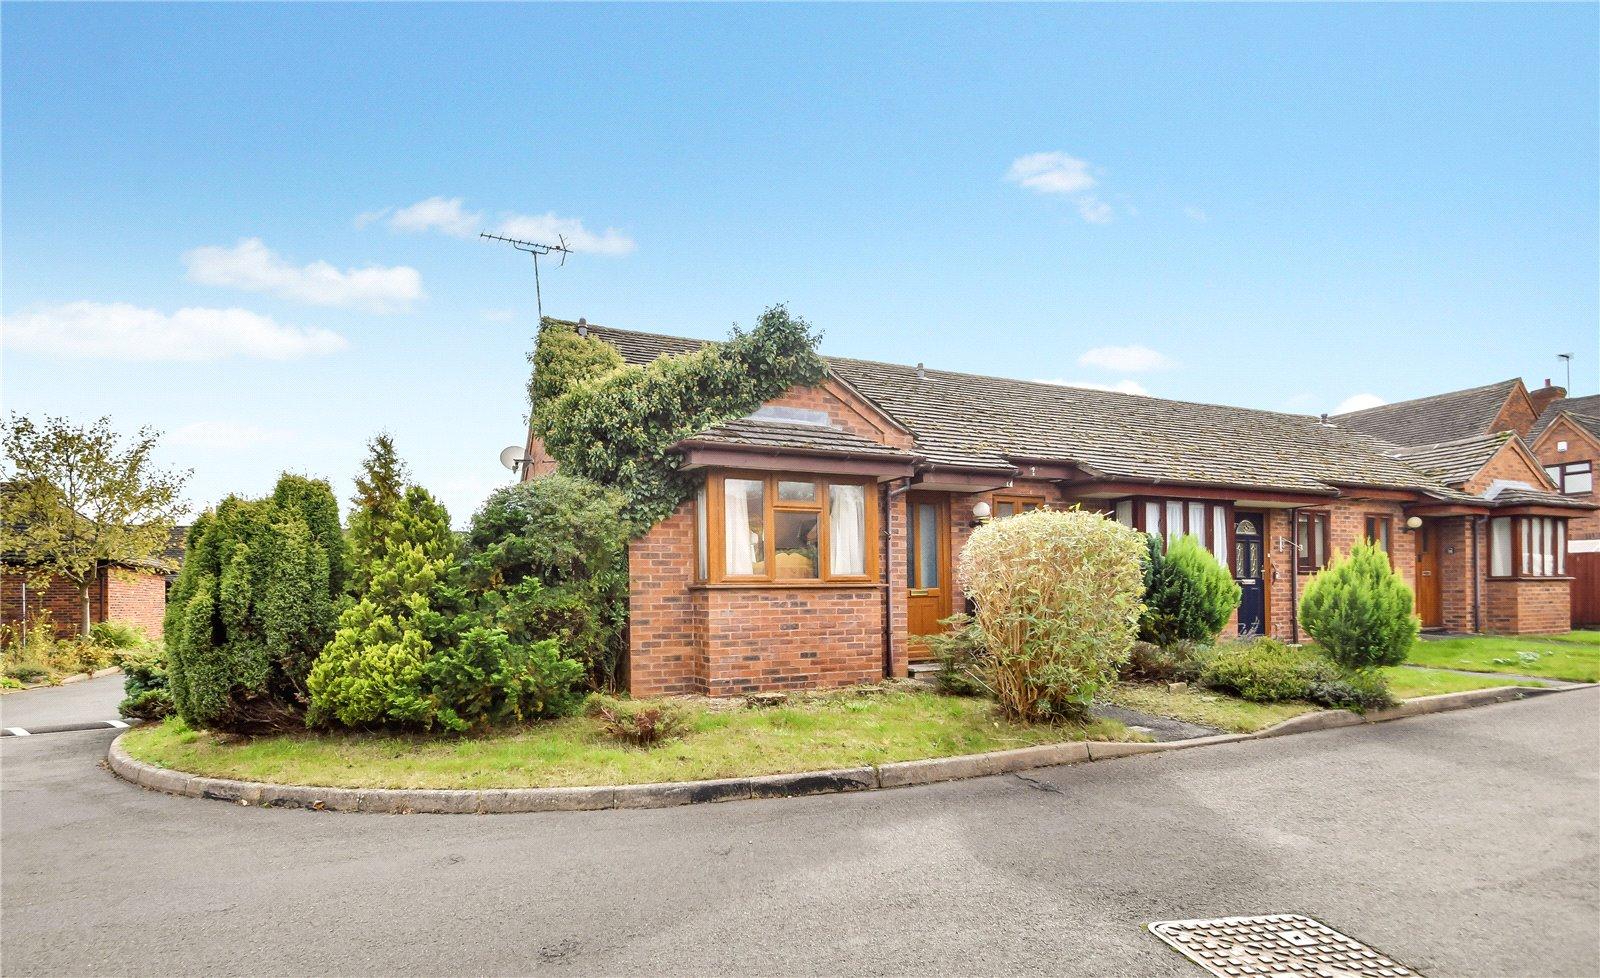 18 Grove Meadow, Cleobury Mortimer, Kidderminster, Shropshire, DY14